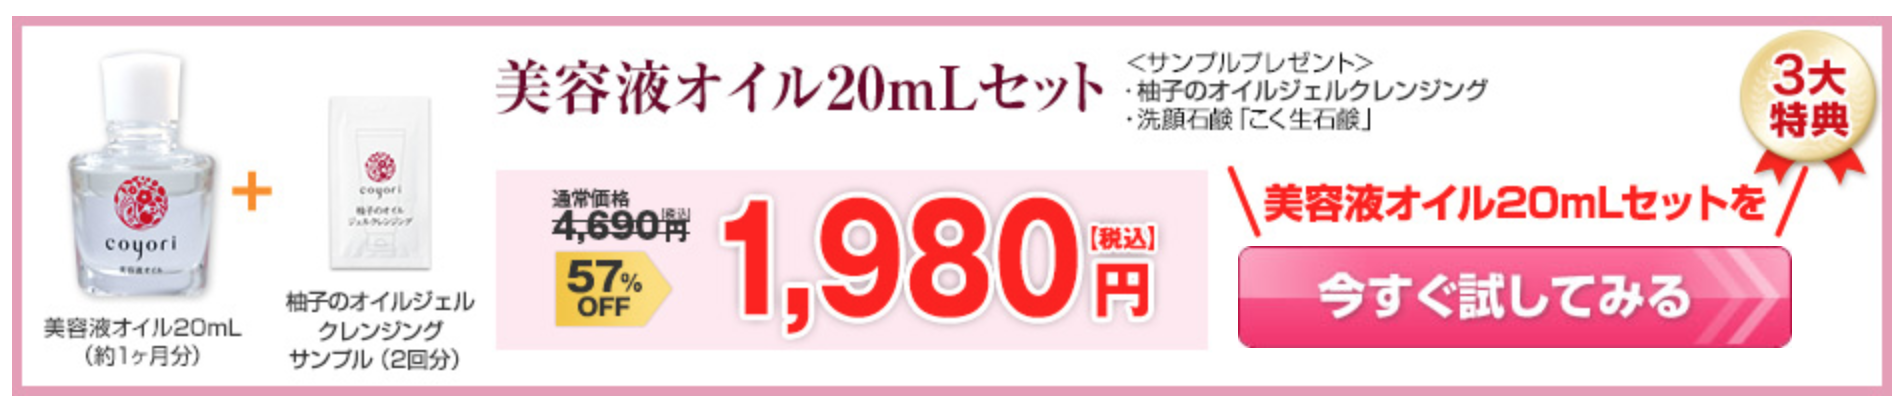 coyori 20mLのモニター商品